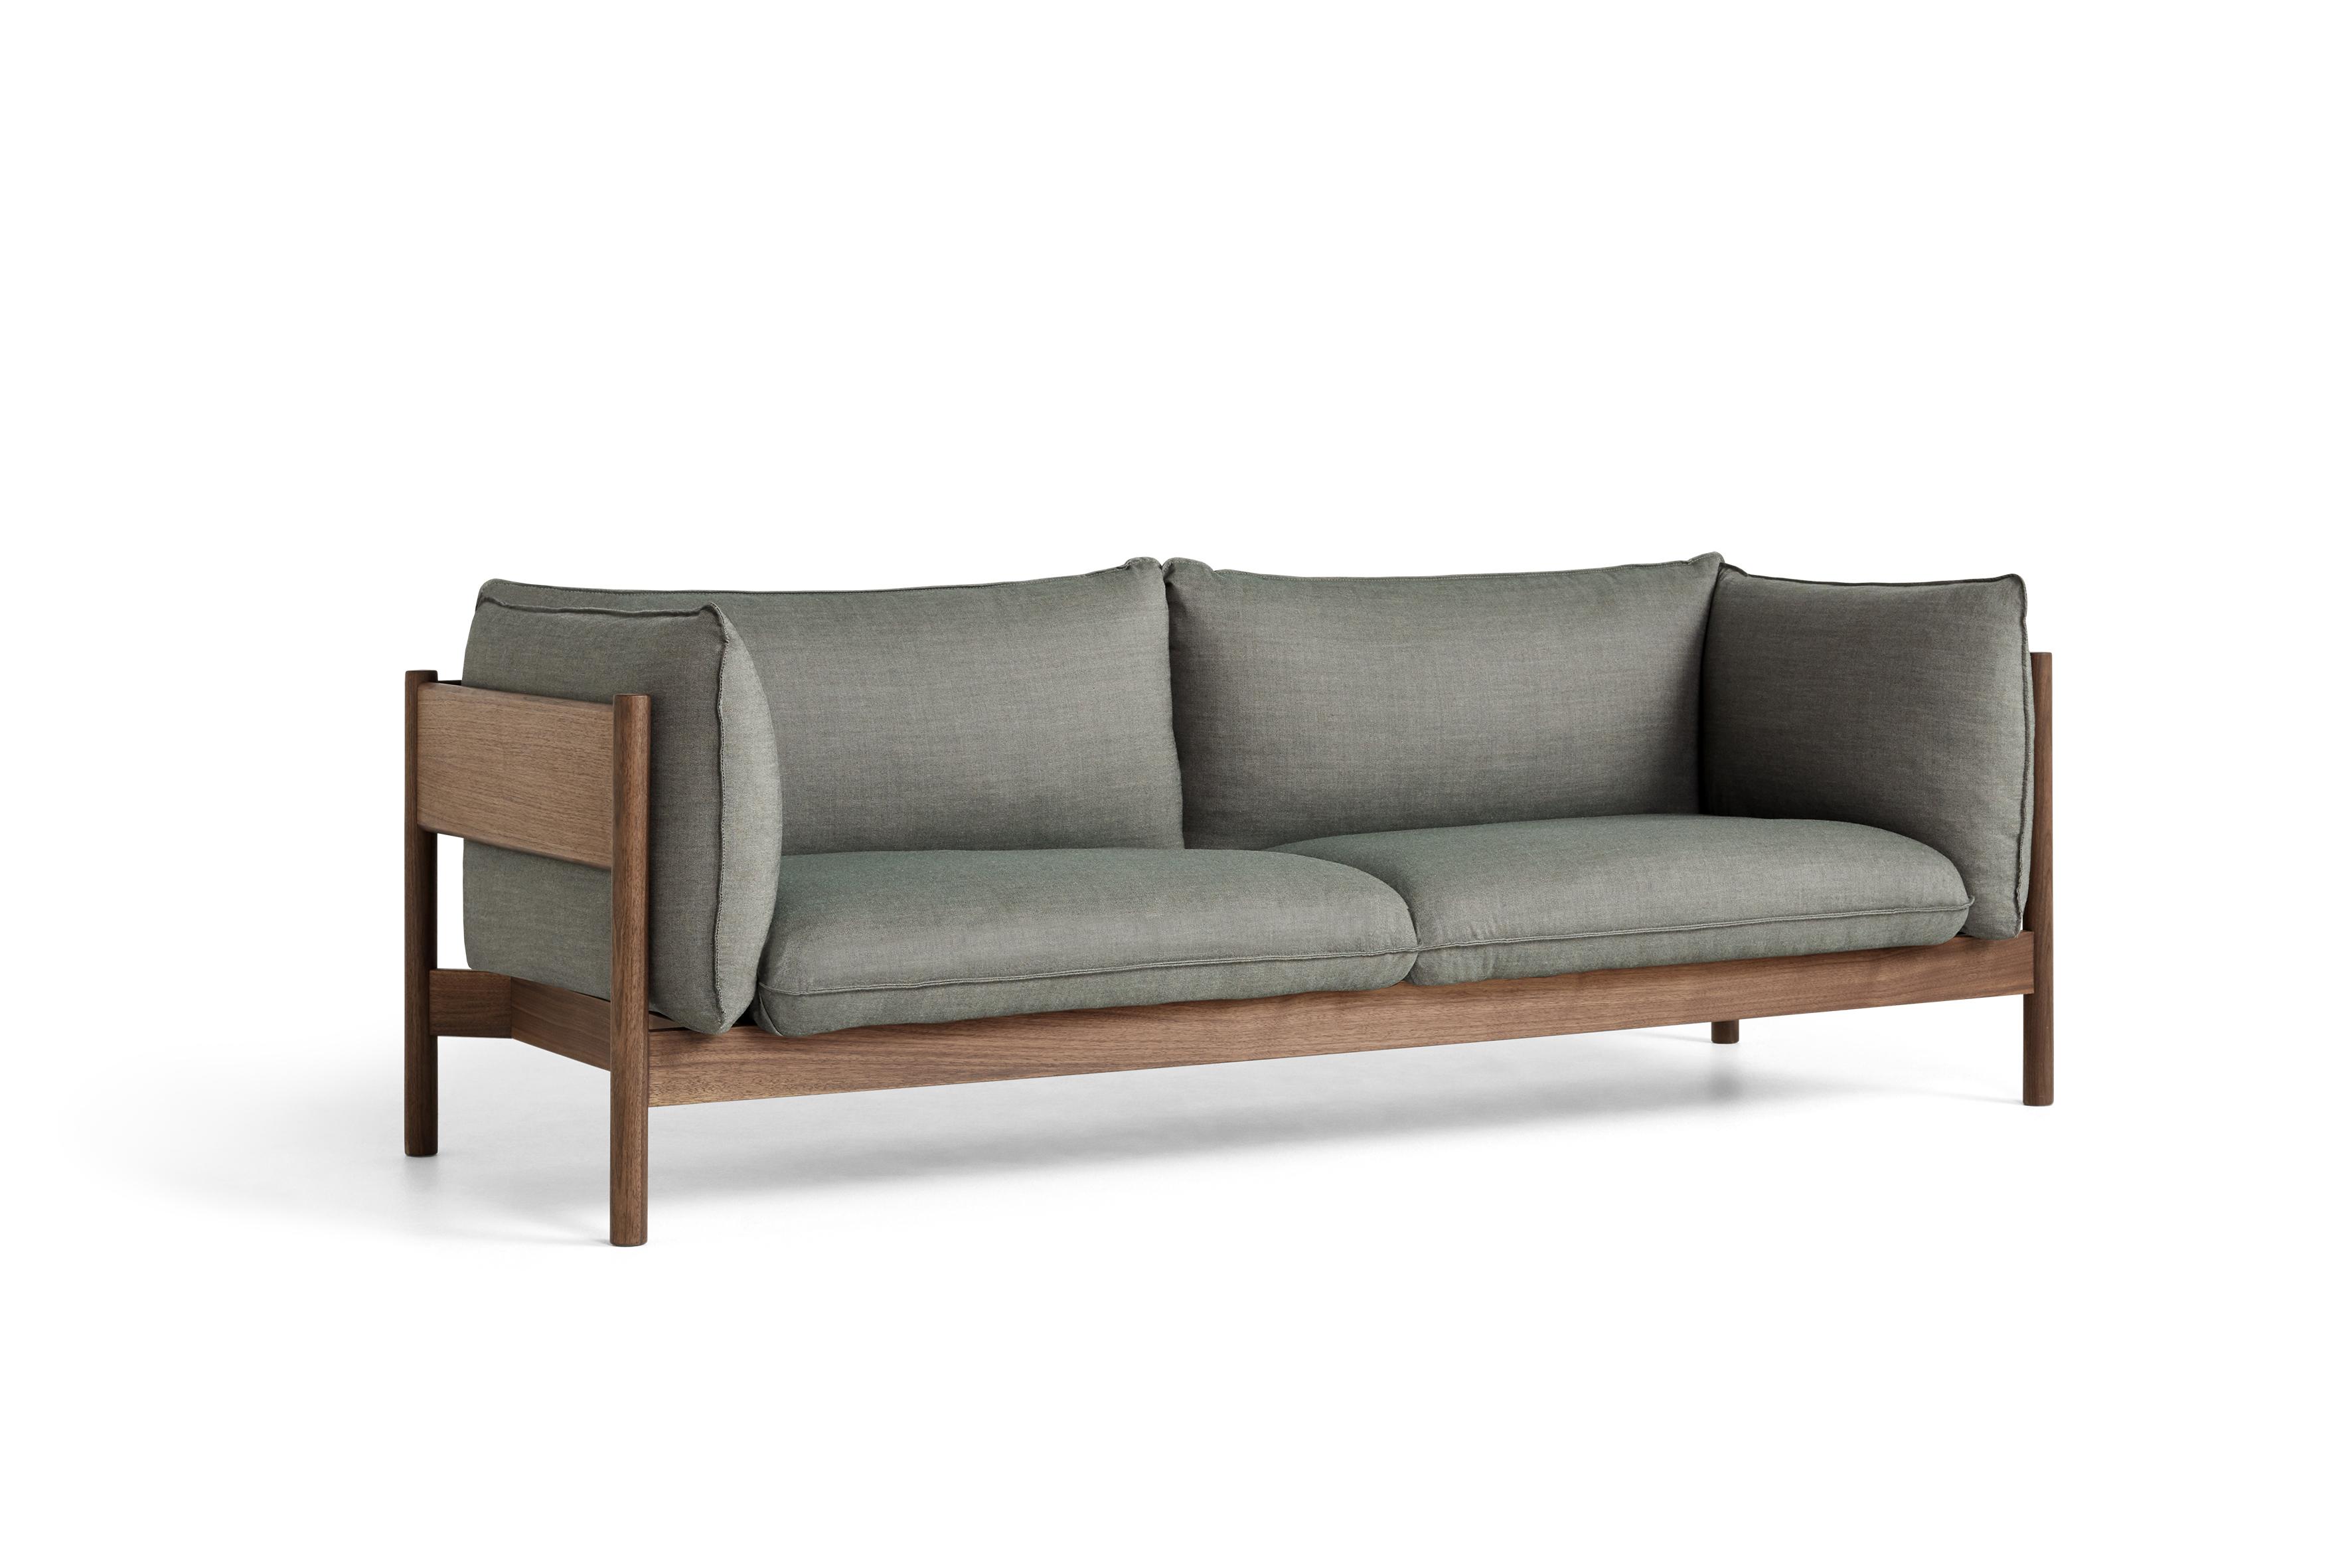 HAY Sofa ARBOUR 3 Sitzer | Walnuss |Atlas 931